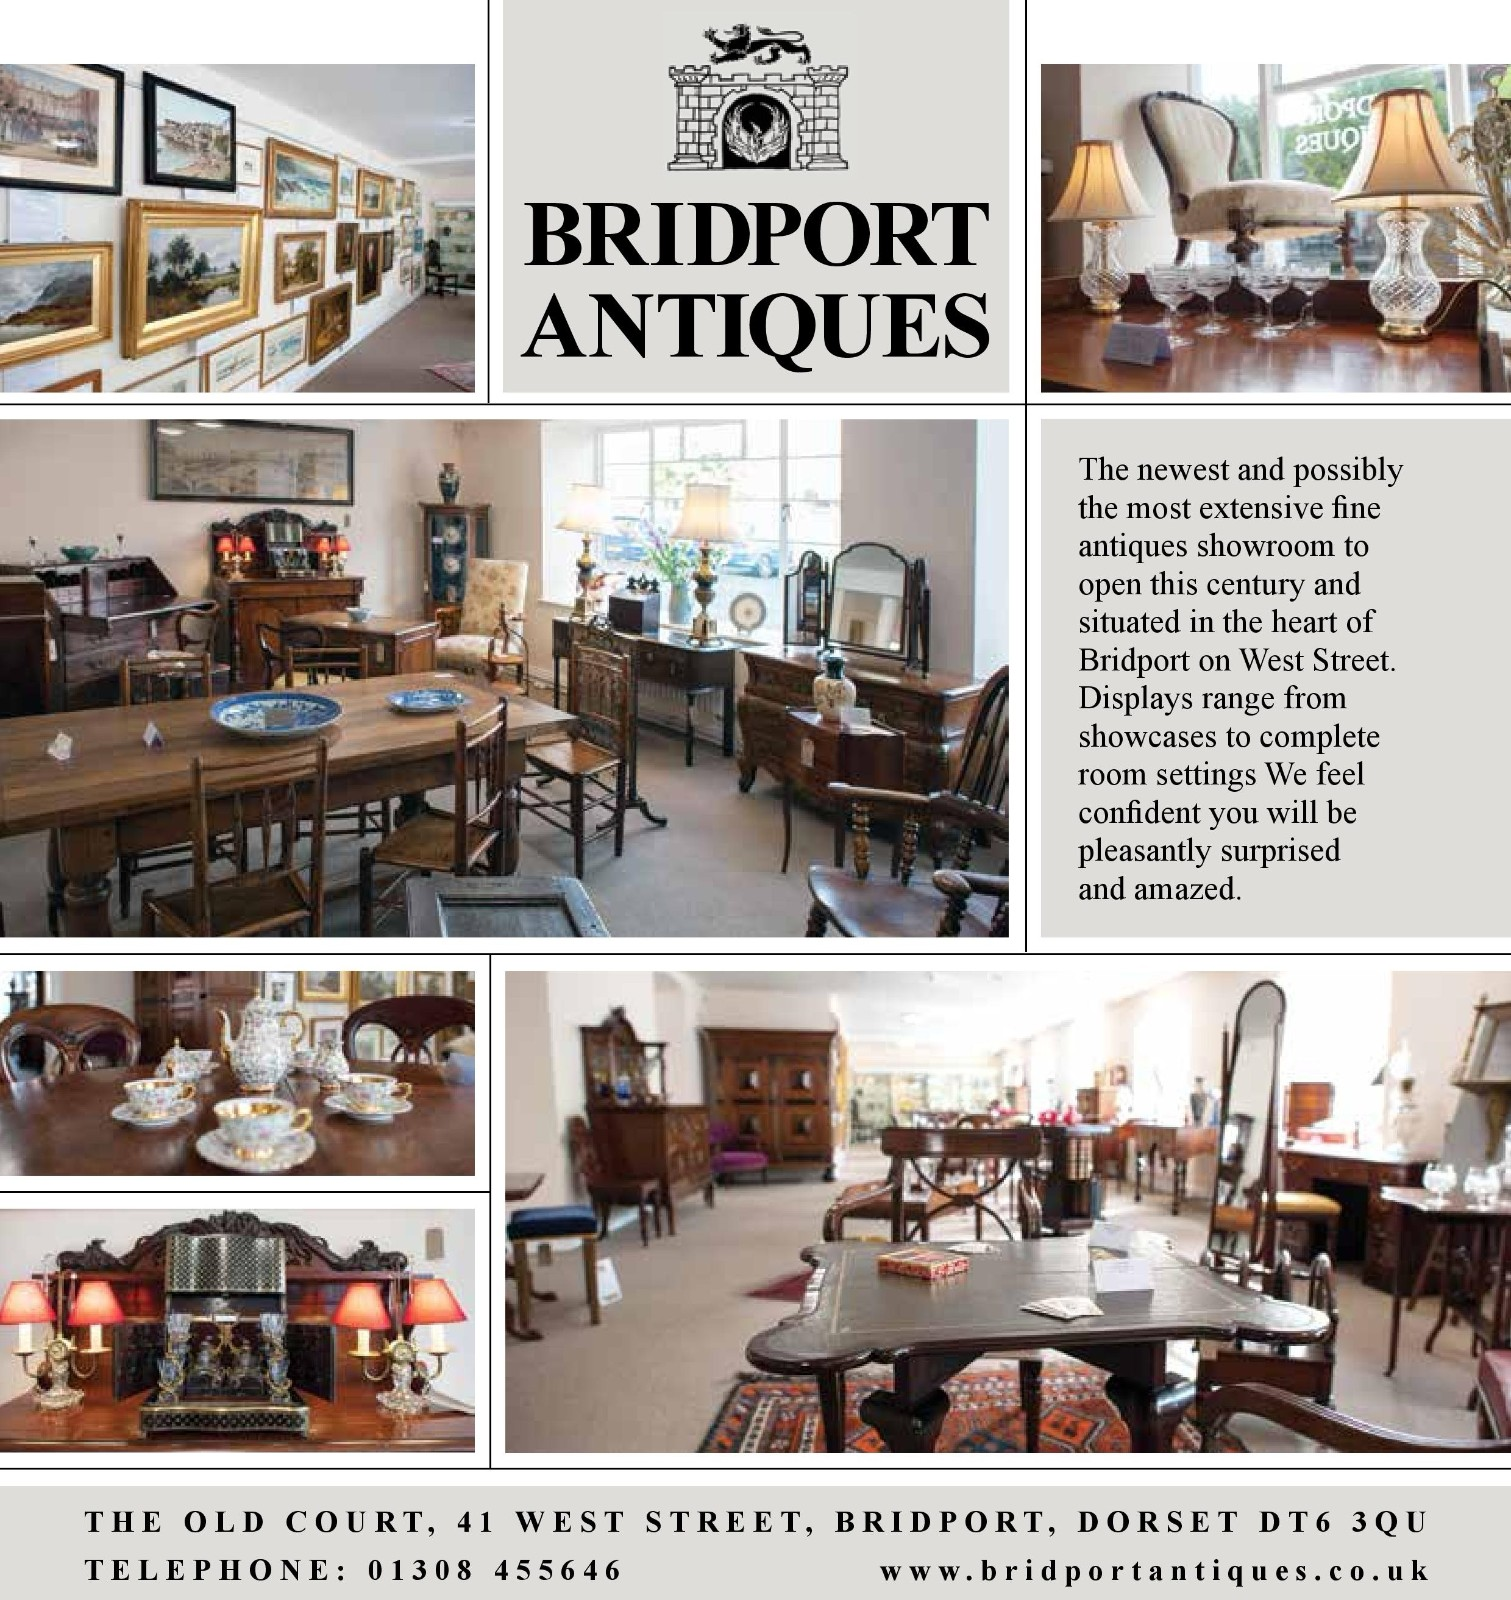 Bridport Antiques image (4 of 11)